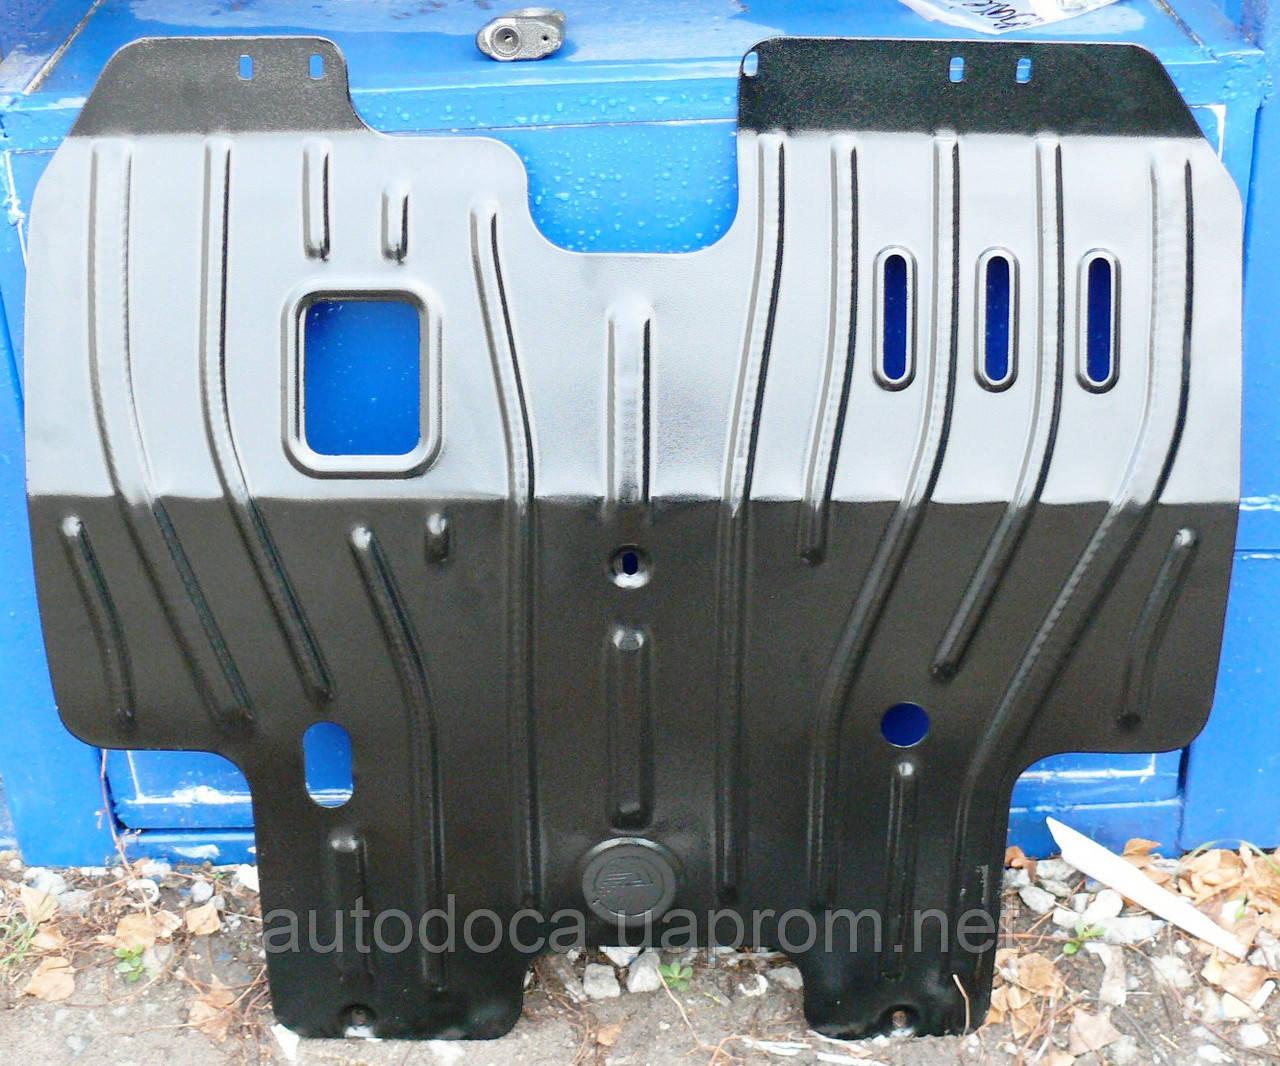 Защита картера двигателя и кпп Suzuki Baleno 1995-